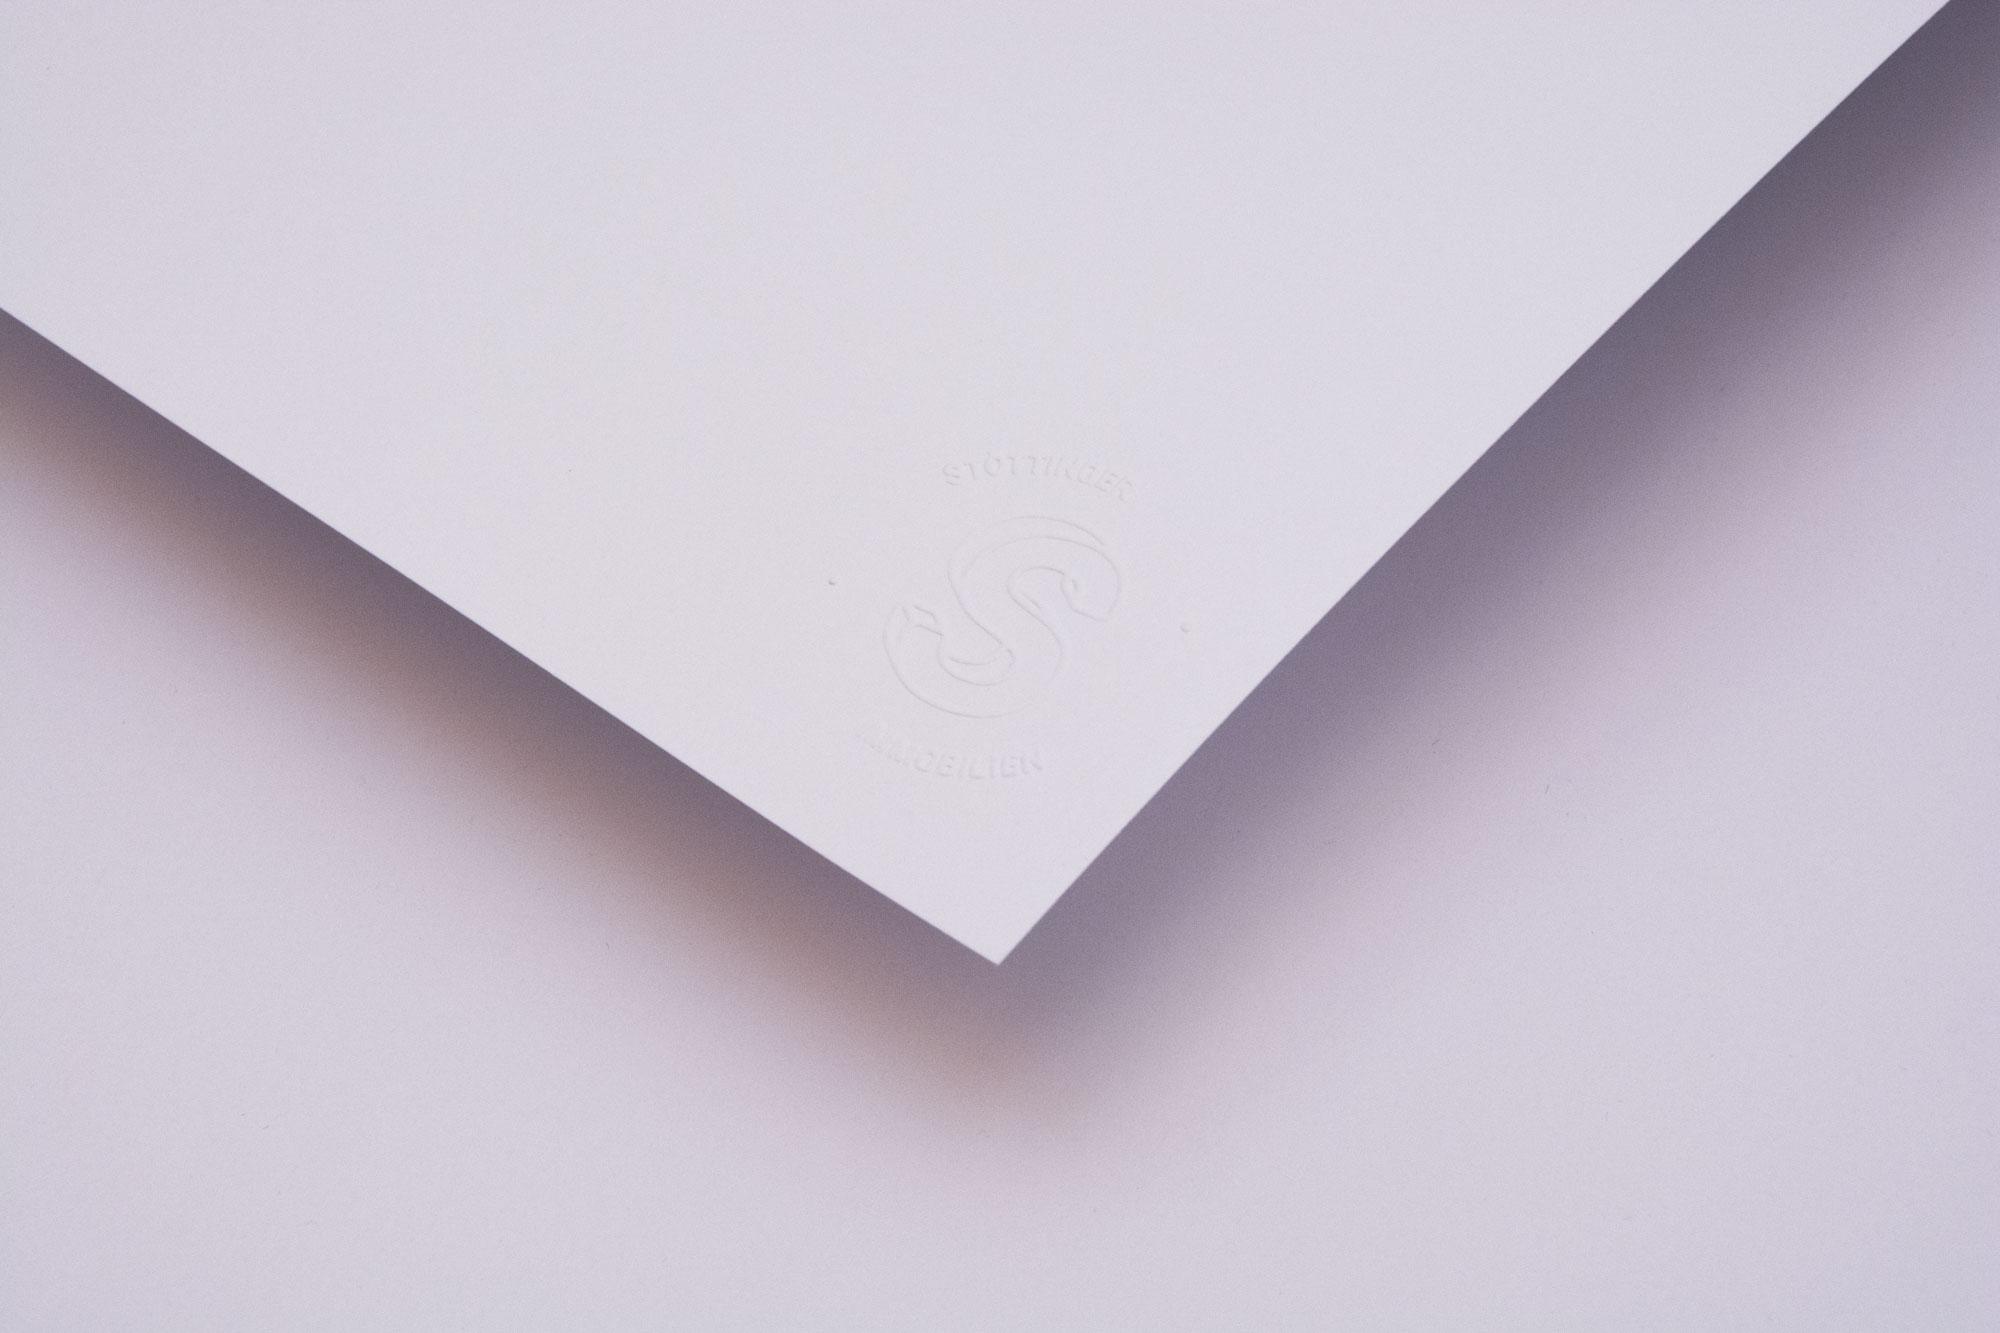 Geprägtes Briefpapier